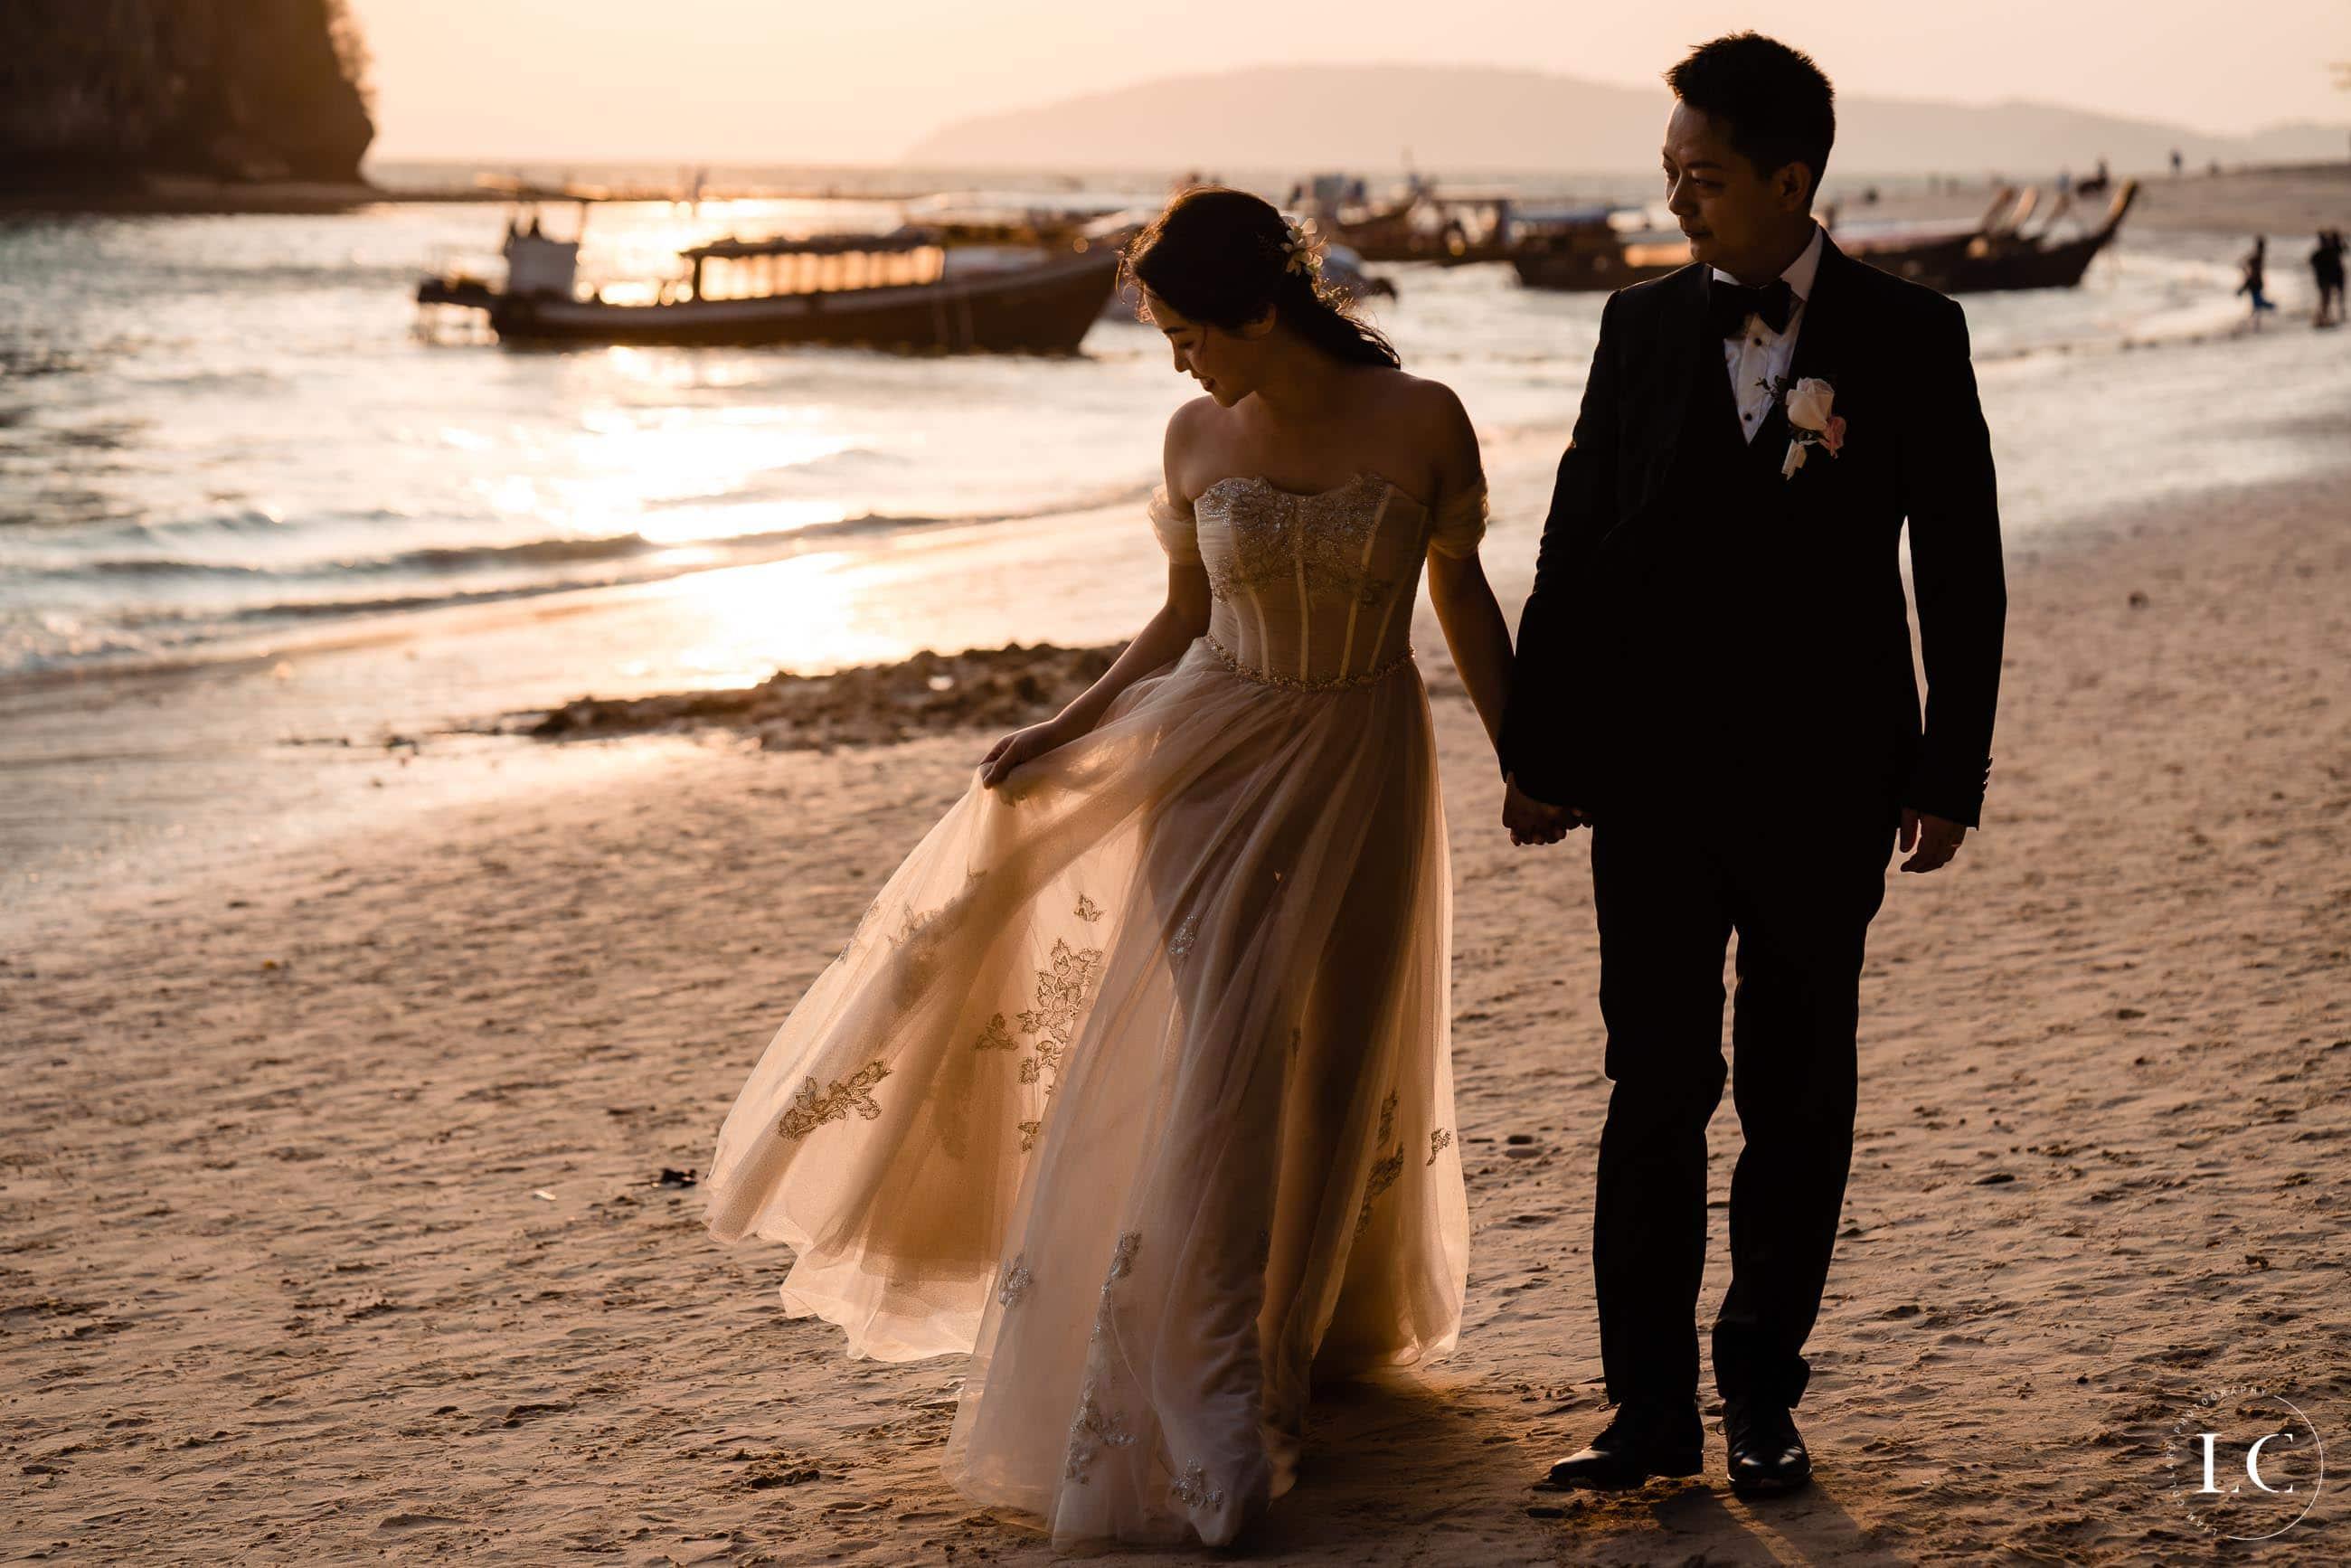 Bride and groom on beach sunset